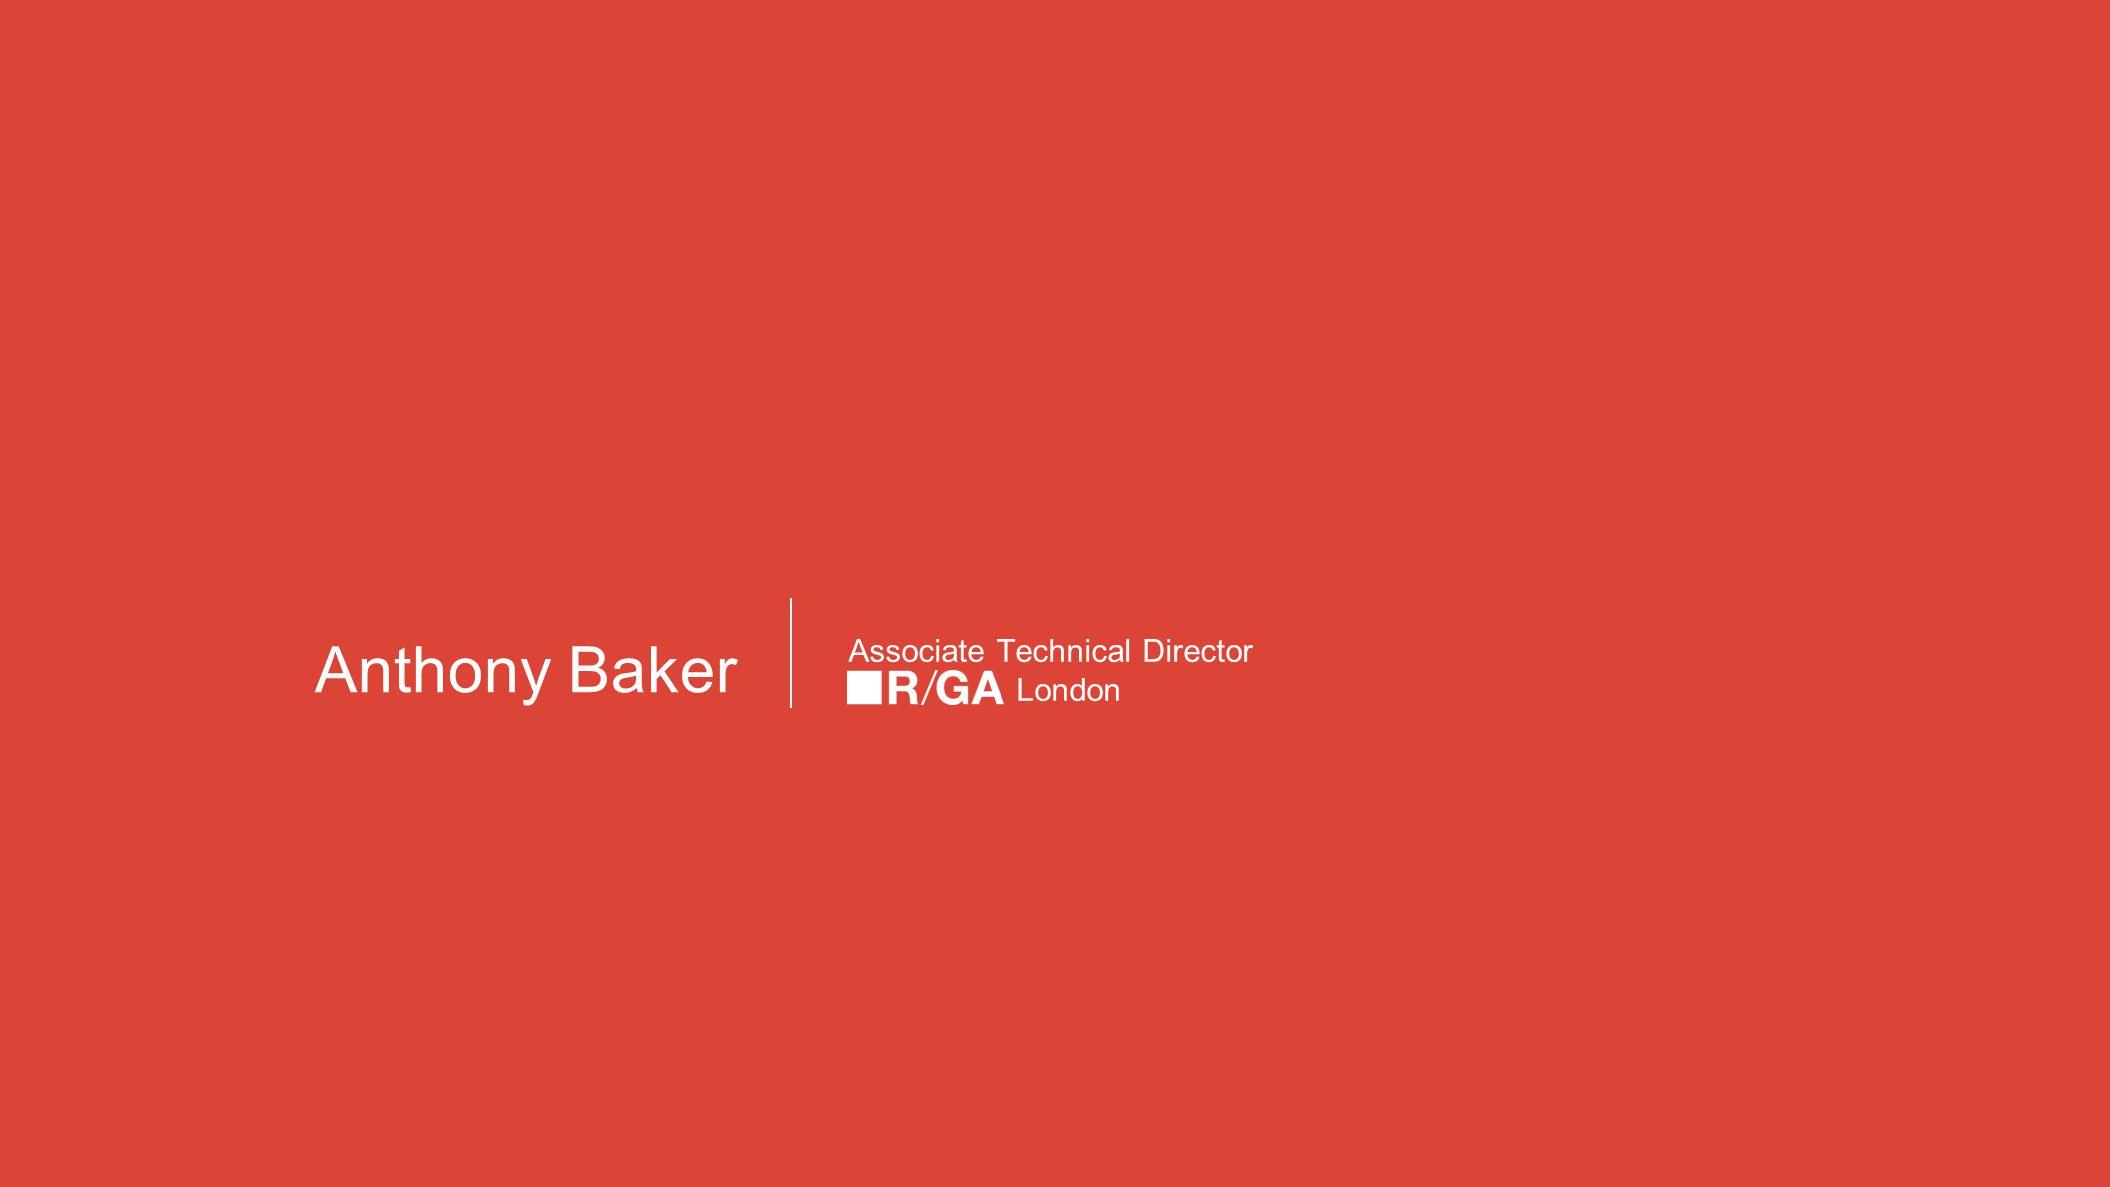 Google themes london - 2 Anthony Baker Associate Technical Director London